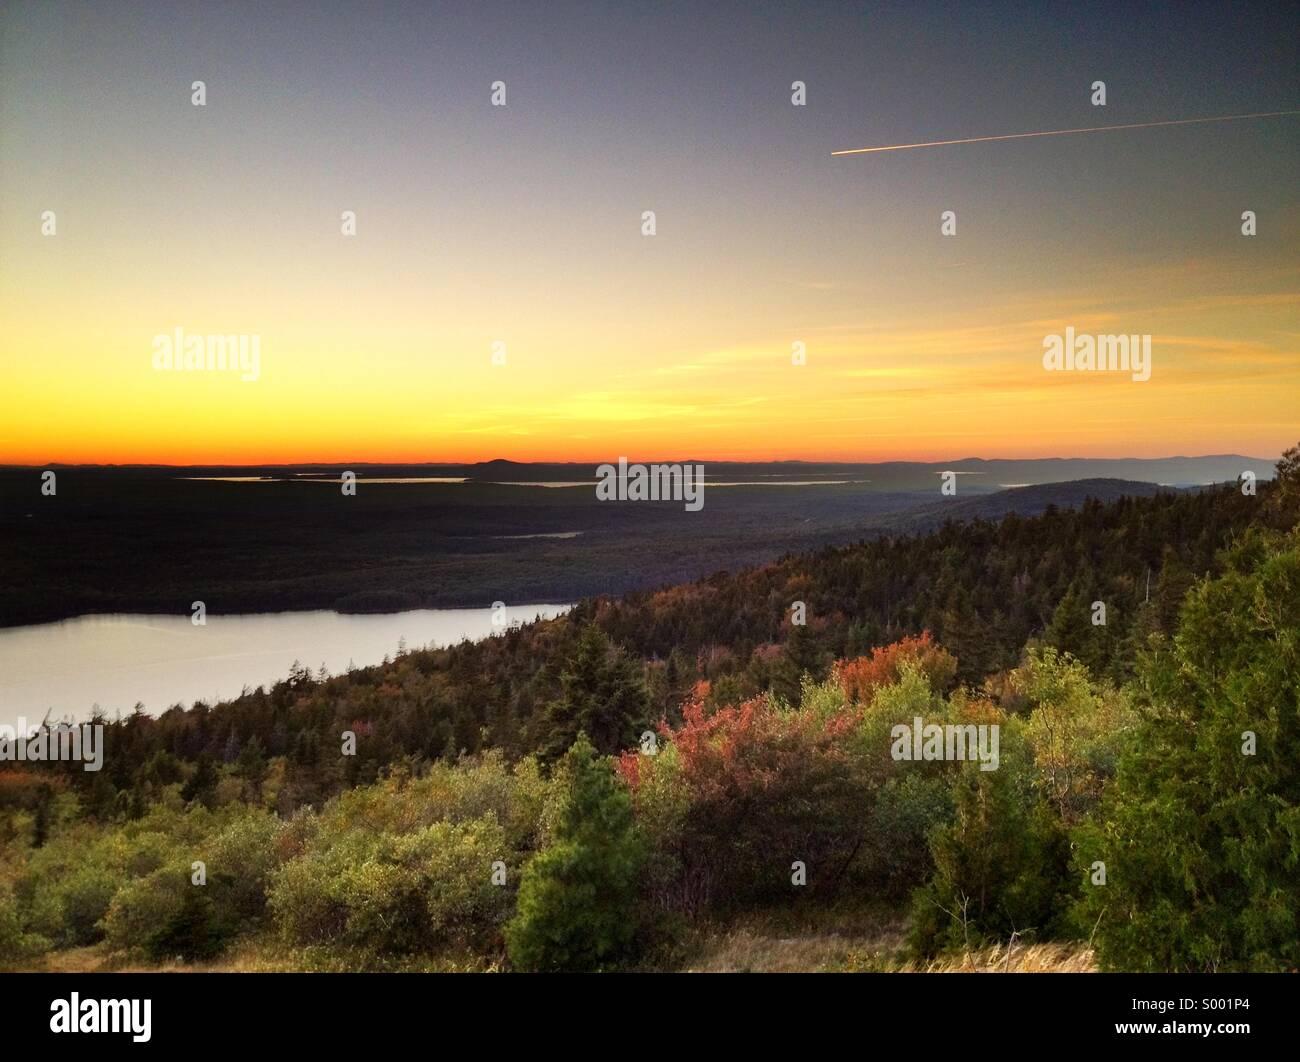 Sunset on Cadillac Mountain, USA Stock Photo